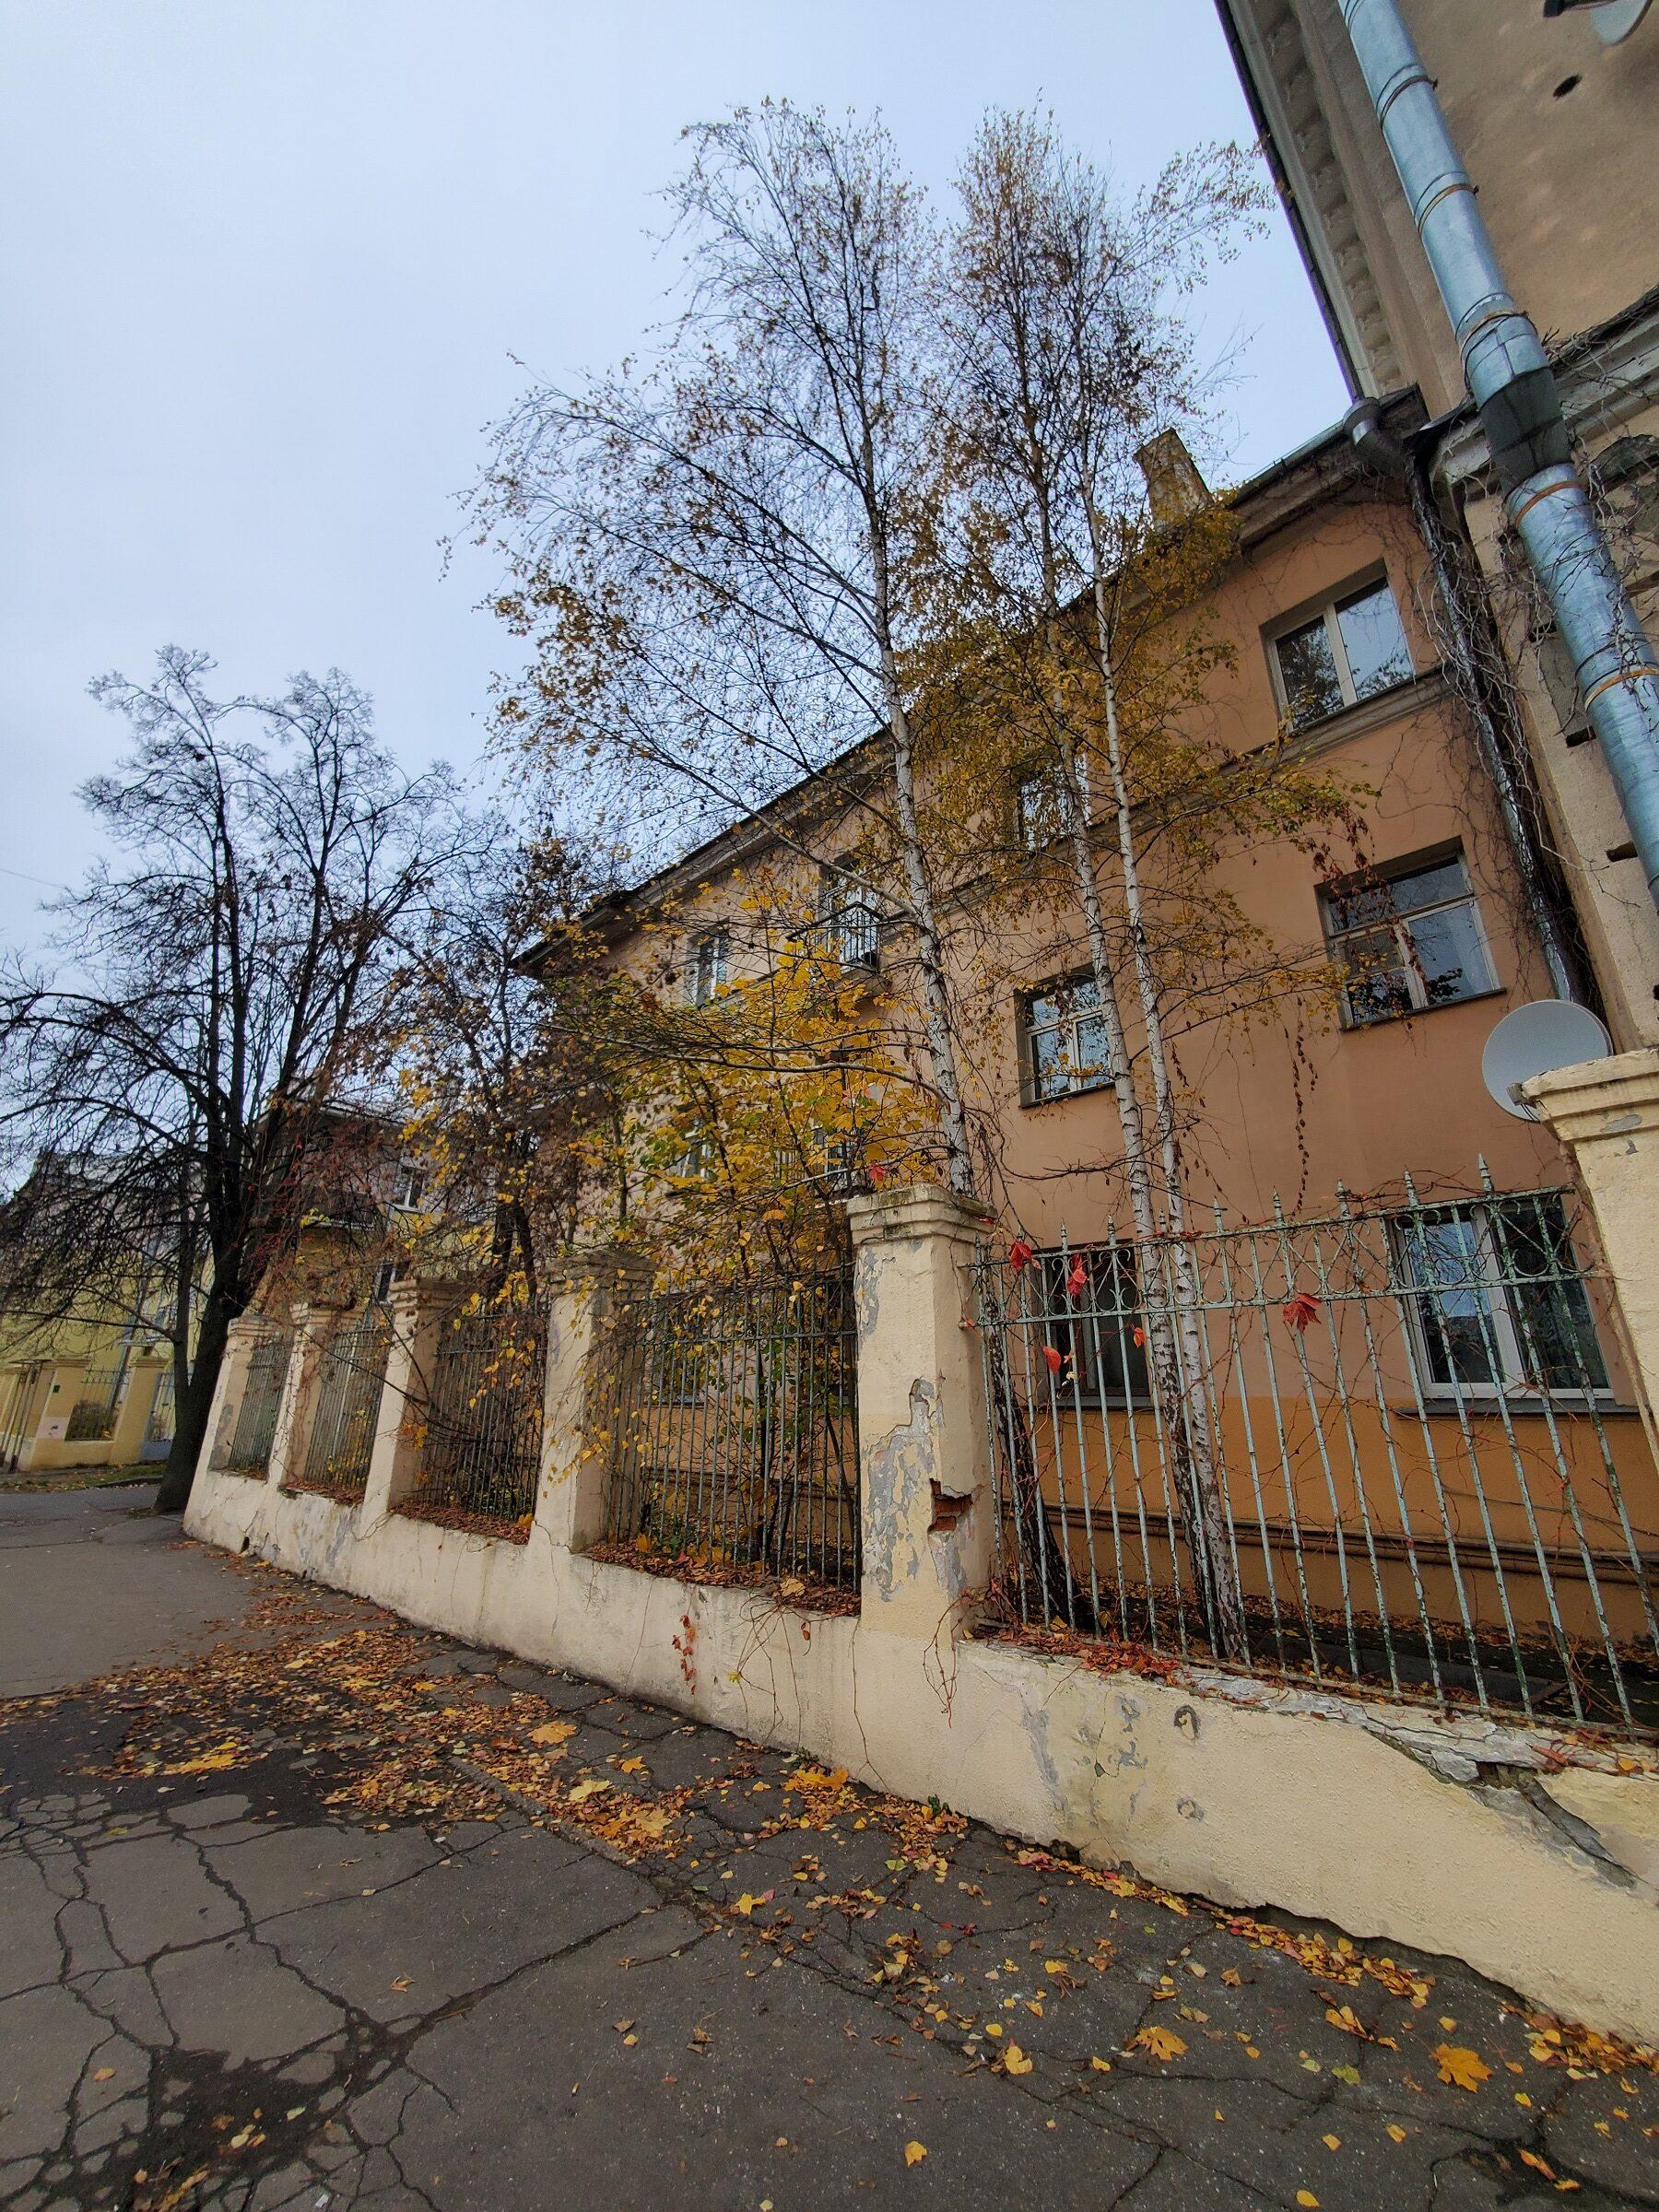 20201107 151331 rotated - Минск. Тракторозаводской поселок